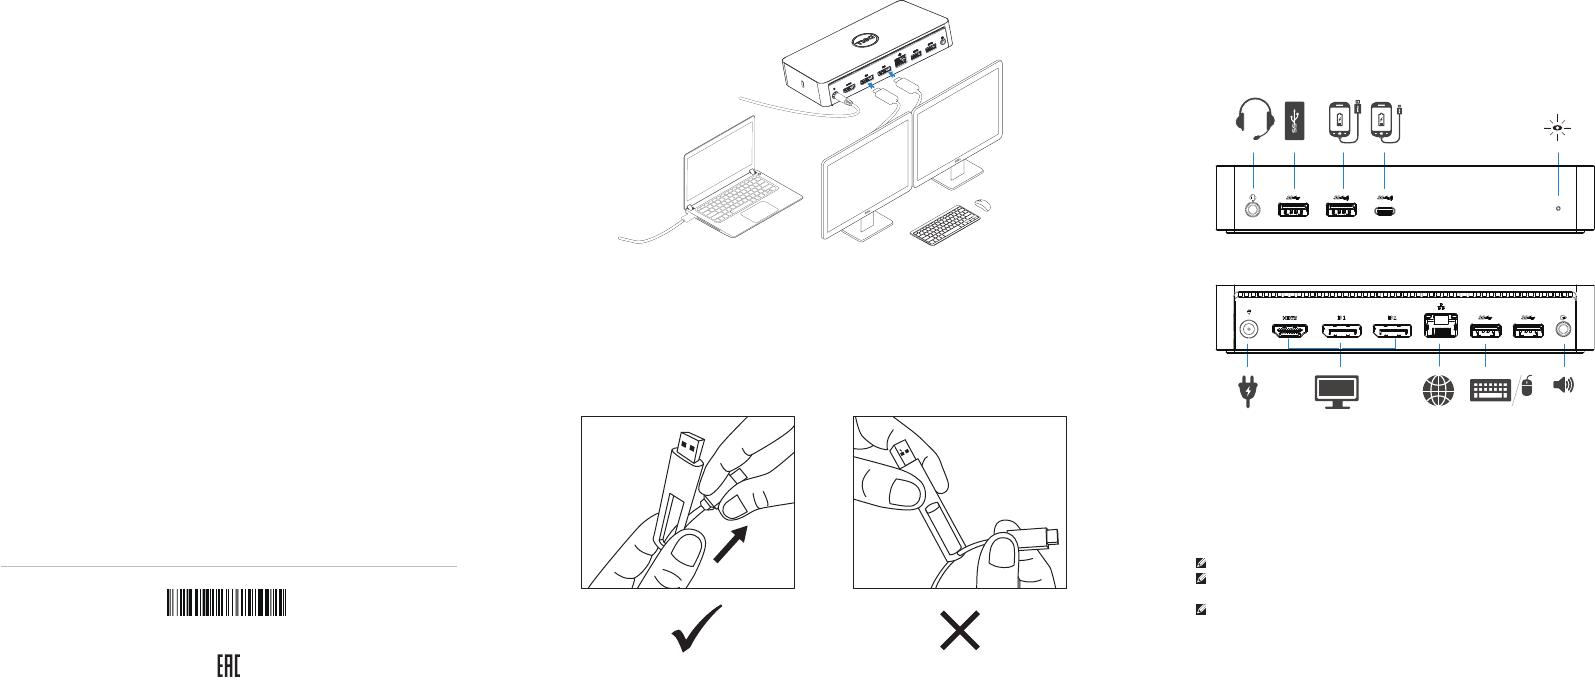 dell d610 docking station manual